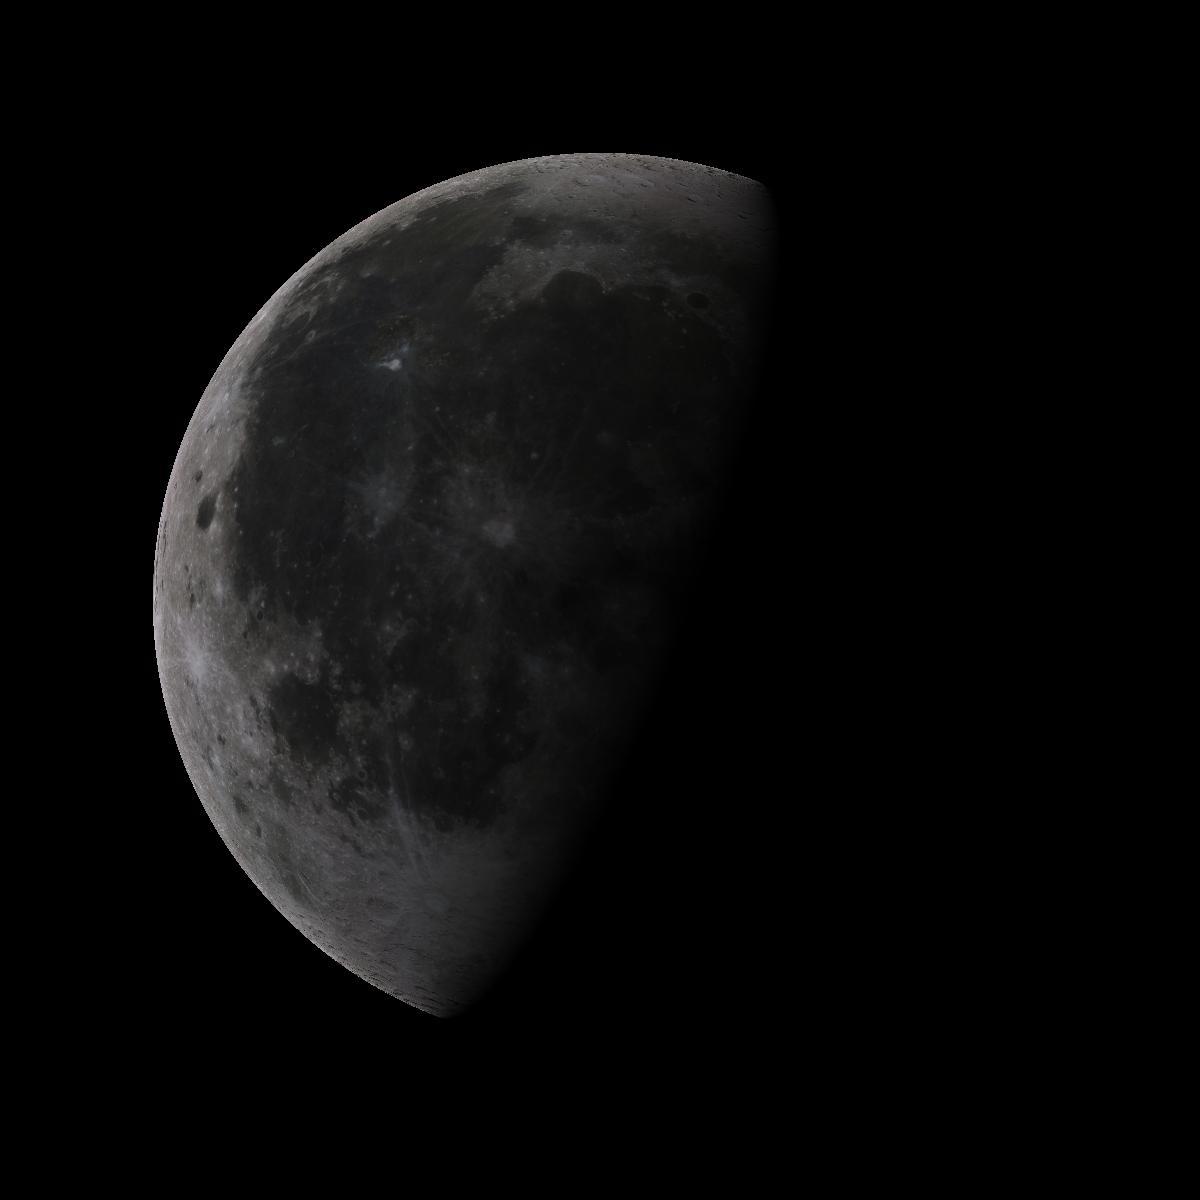 Lune du 24 juillet 2019